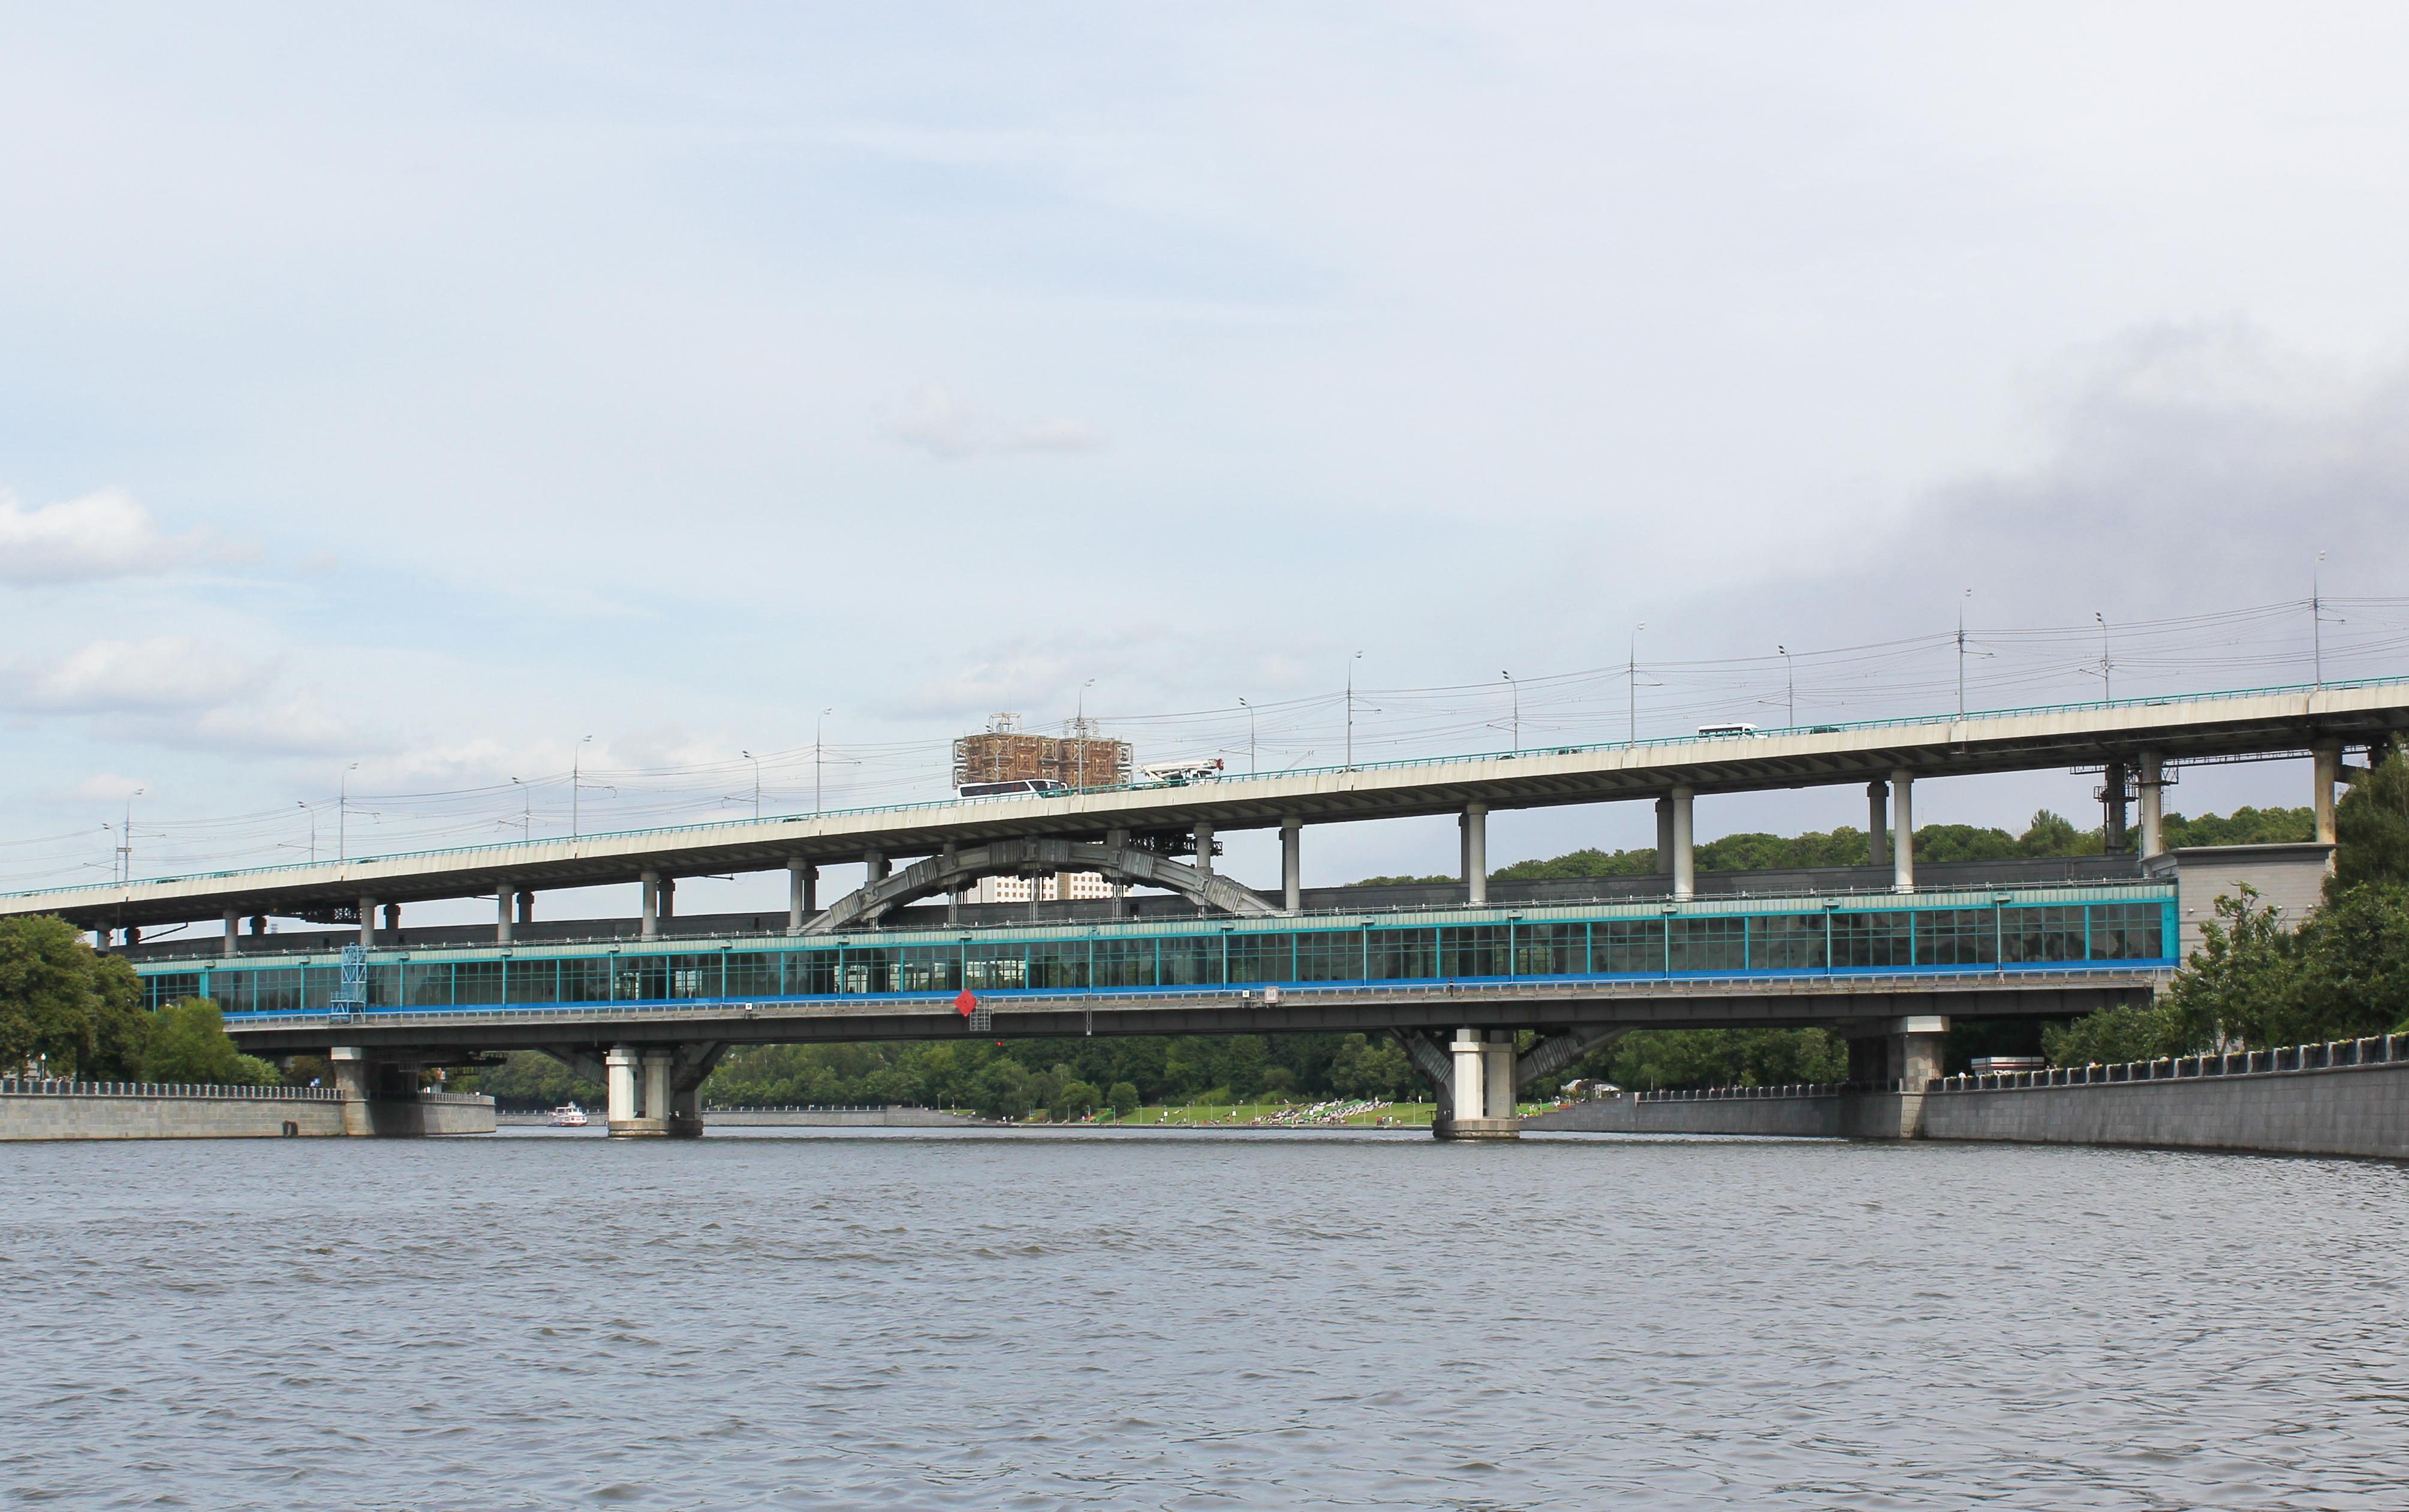 Luzjnetskijbron